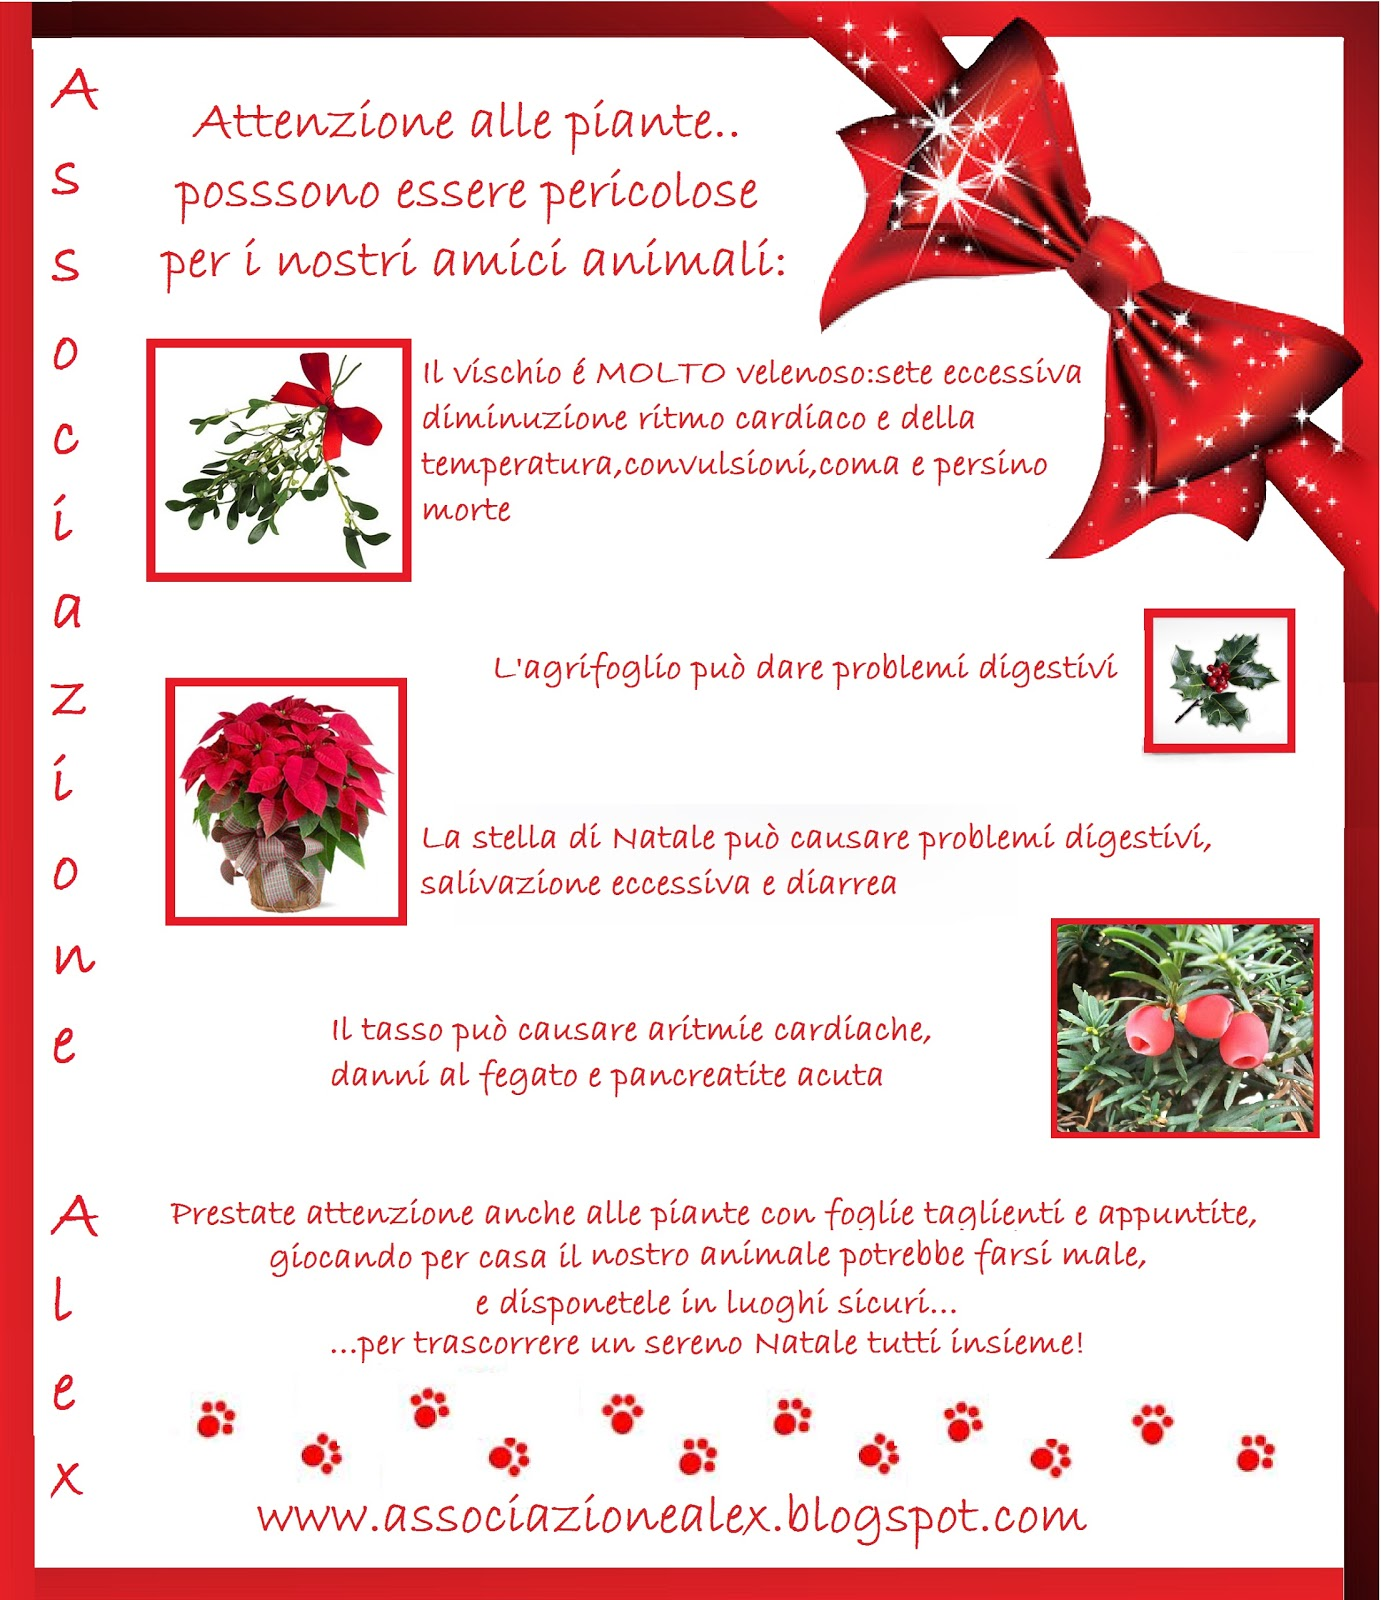 Associazione alex piante natalizie velenose per i nostri for Piante velenose per i cani